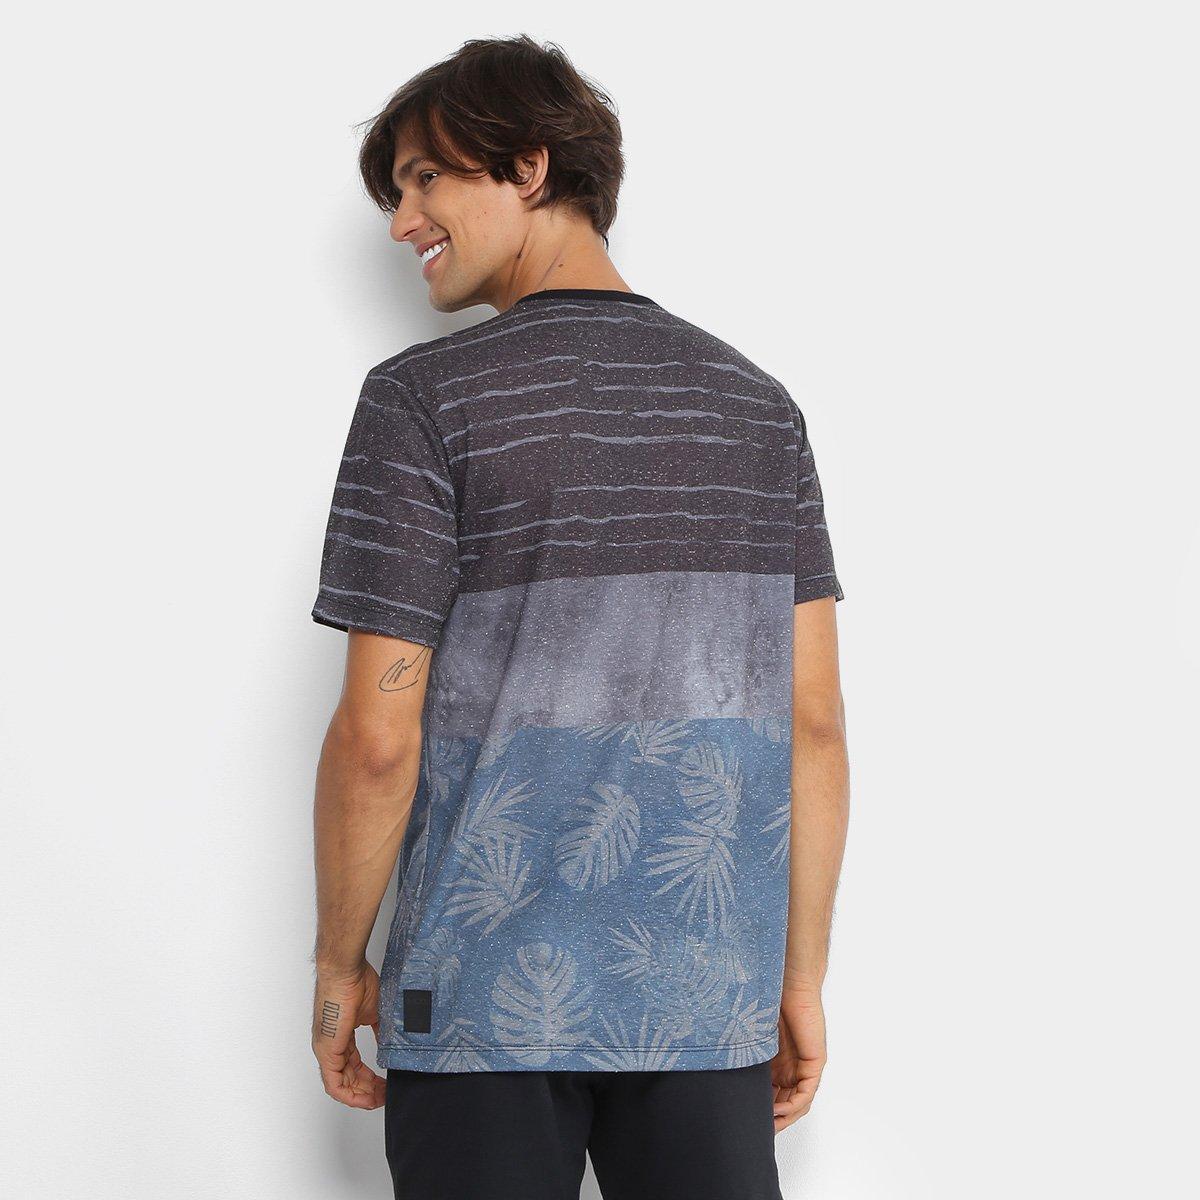 Camiseta MCD Especial Geo Organic Masculina - Azul Petróleo - Compre ... 7f269a6901a